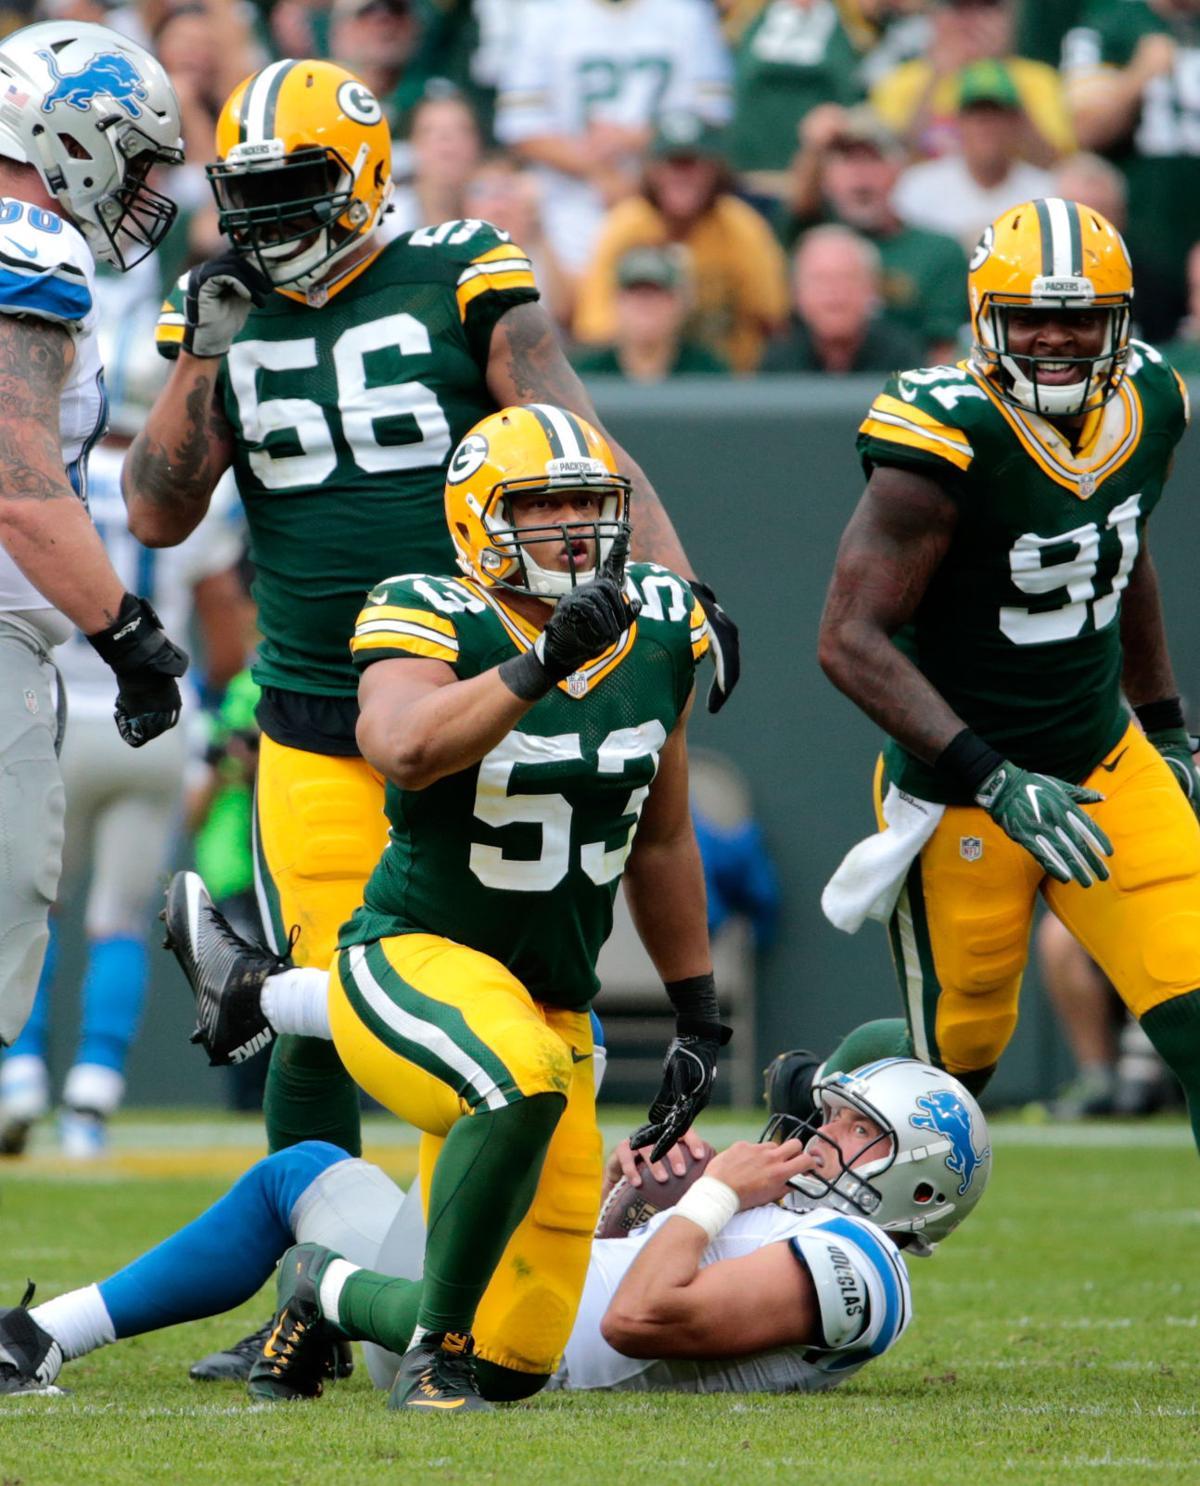 Packers Linebacker Nick Perry kept defensive back Micah Hyde